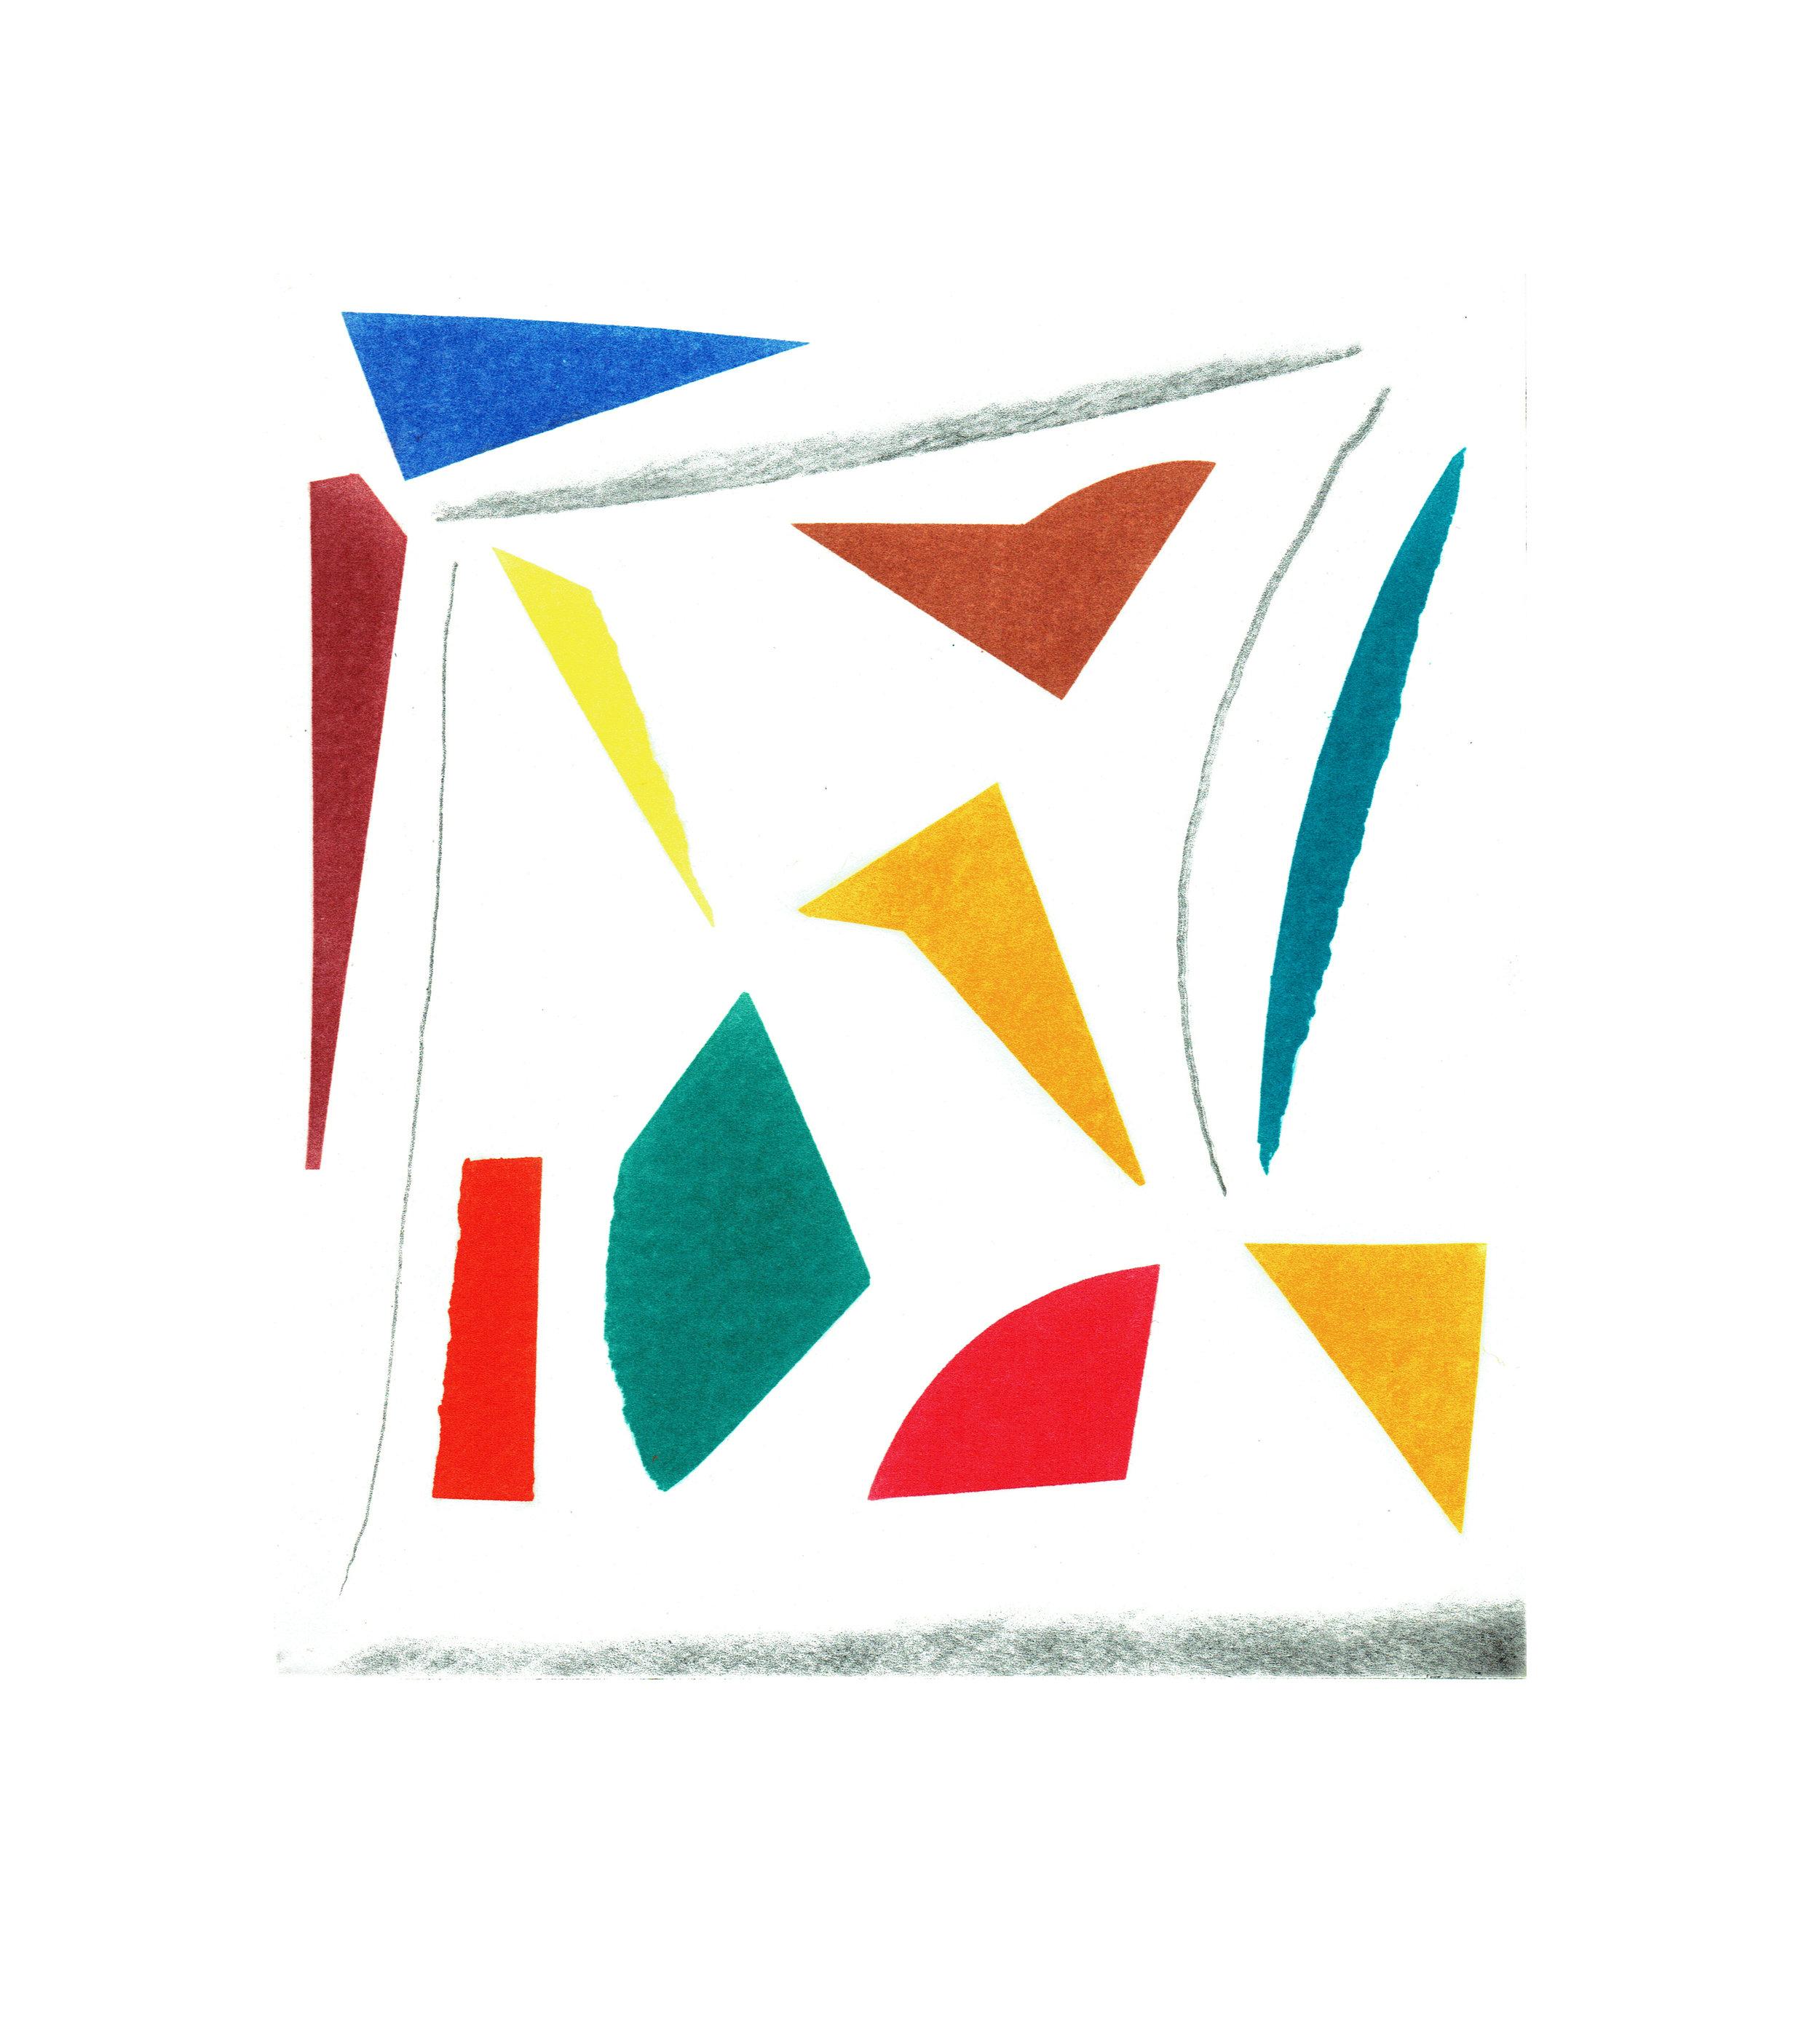 John McLean, Merry Go Round 4    Date: 2016  Size (cm - unframed):  38.2 x 34.4  Technique:  2 plate a la poupee etching  Materials:  Somerset Valvet 300gsm  Edition size:  20  Publisher: The Print Studio  Copyright: The Artist   POA